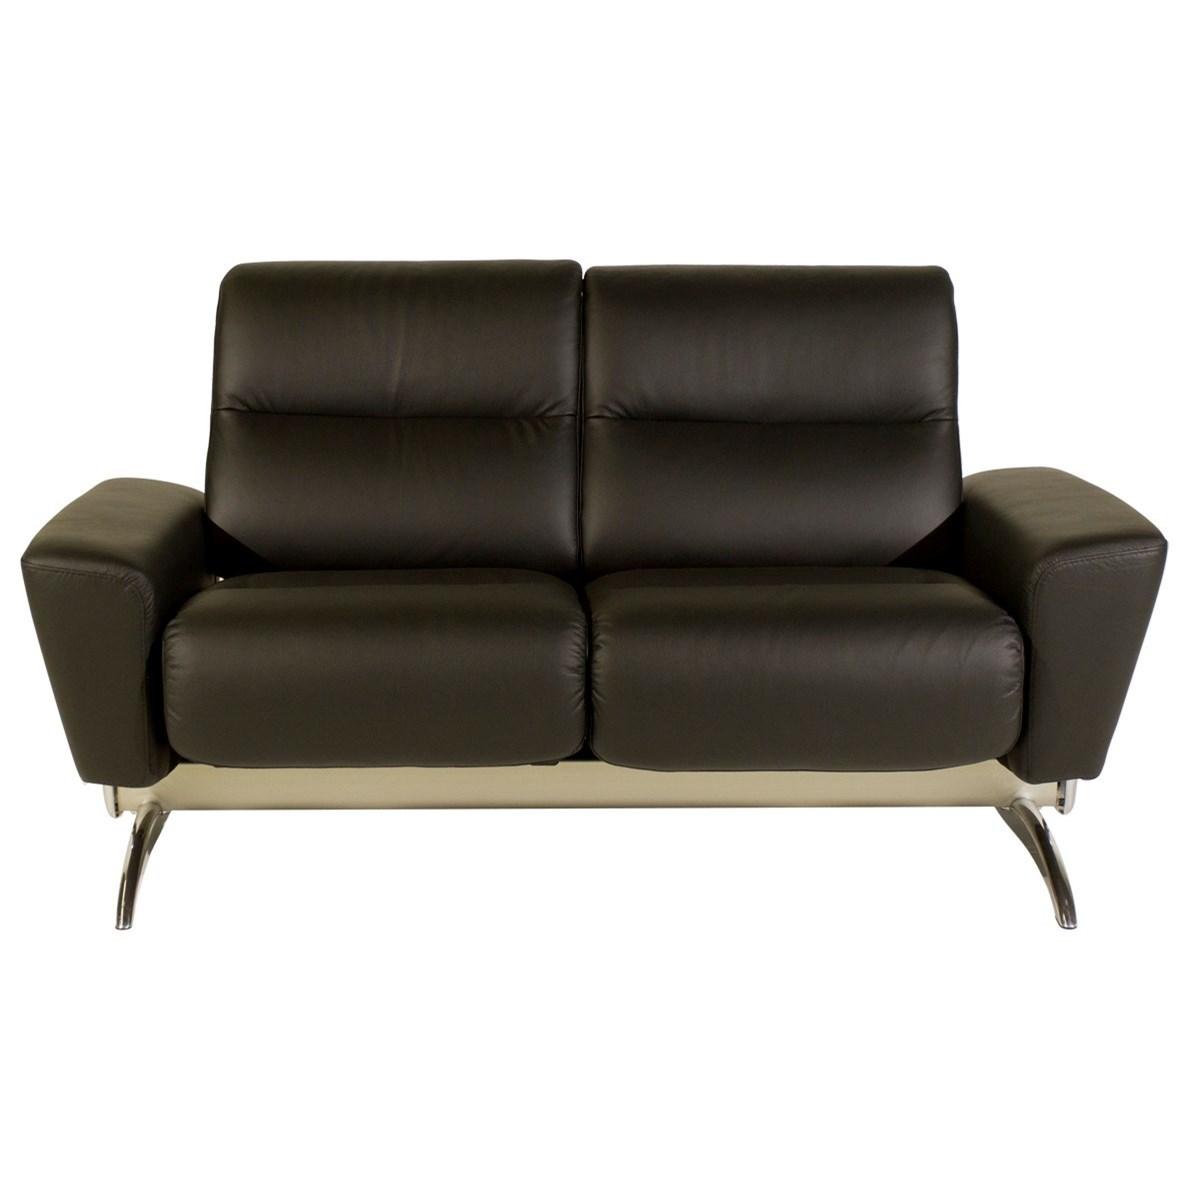 2 seater love chair steel in madurai stressless you 1501020 julia loveseat